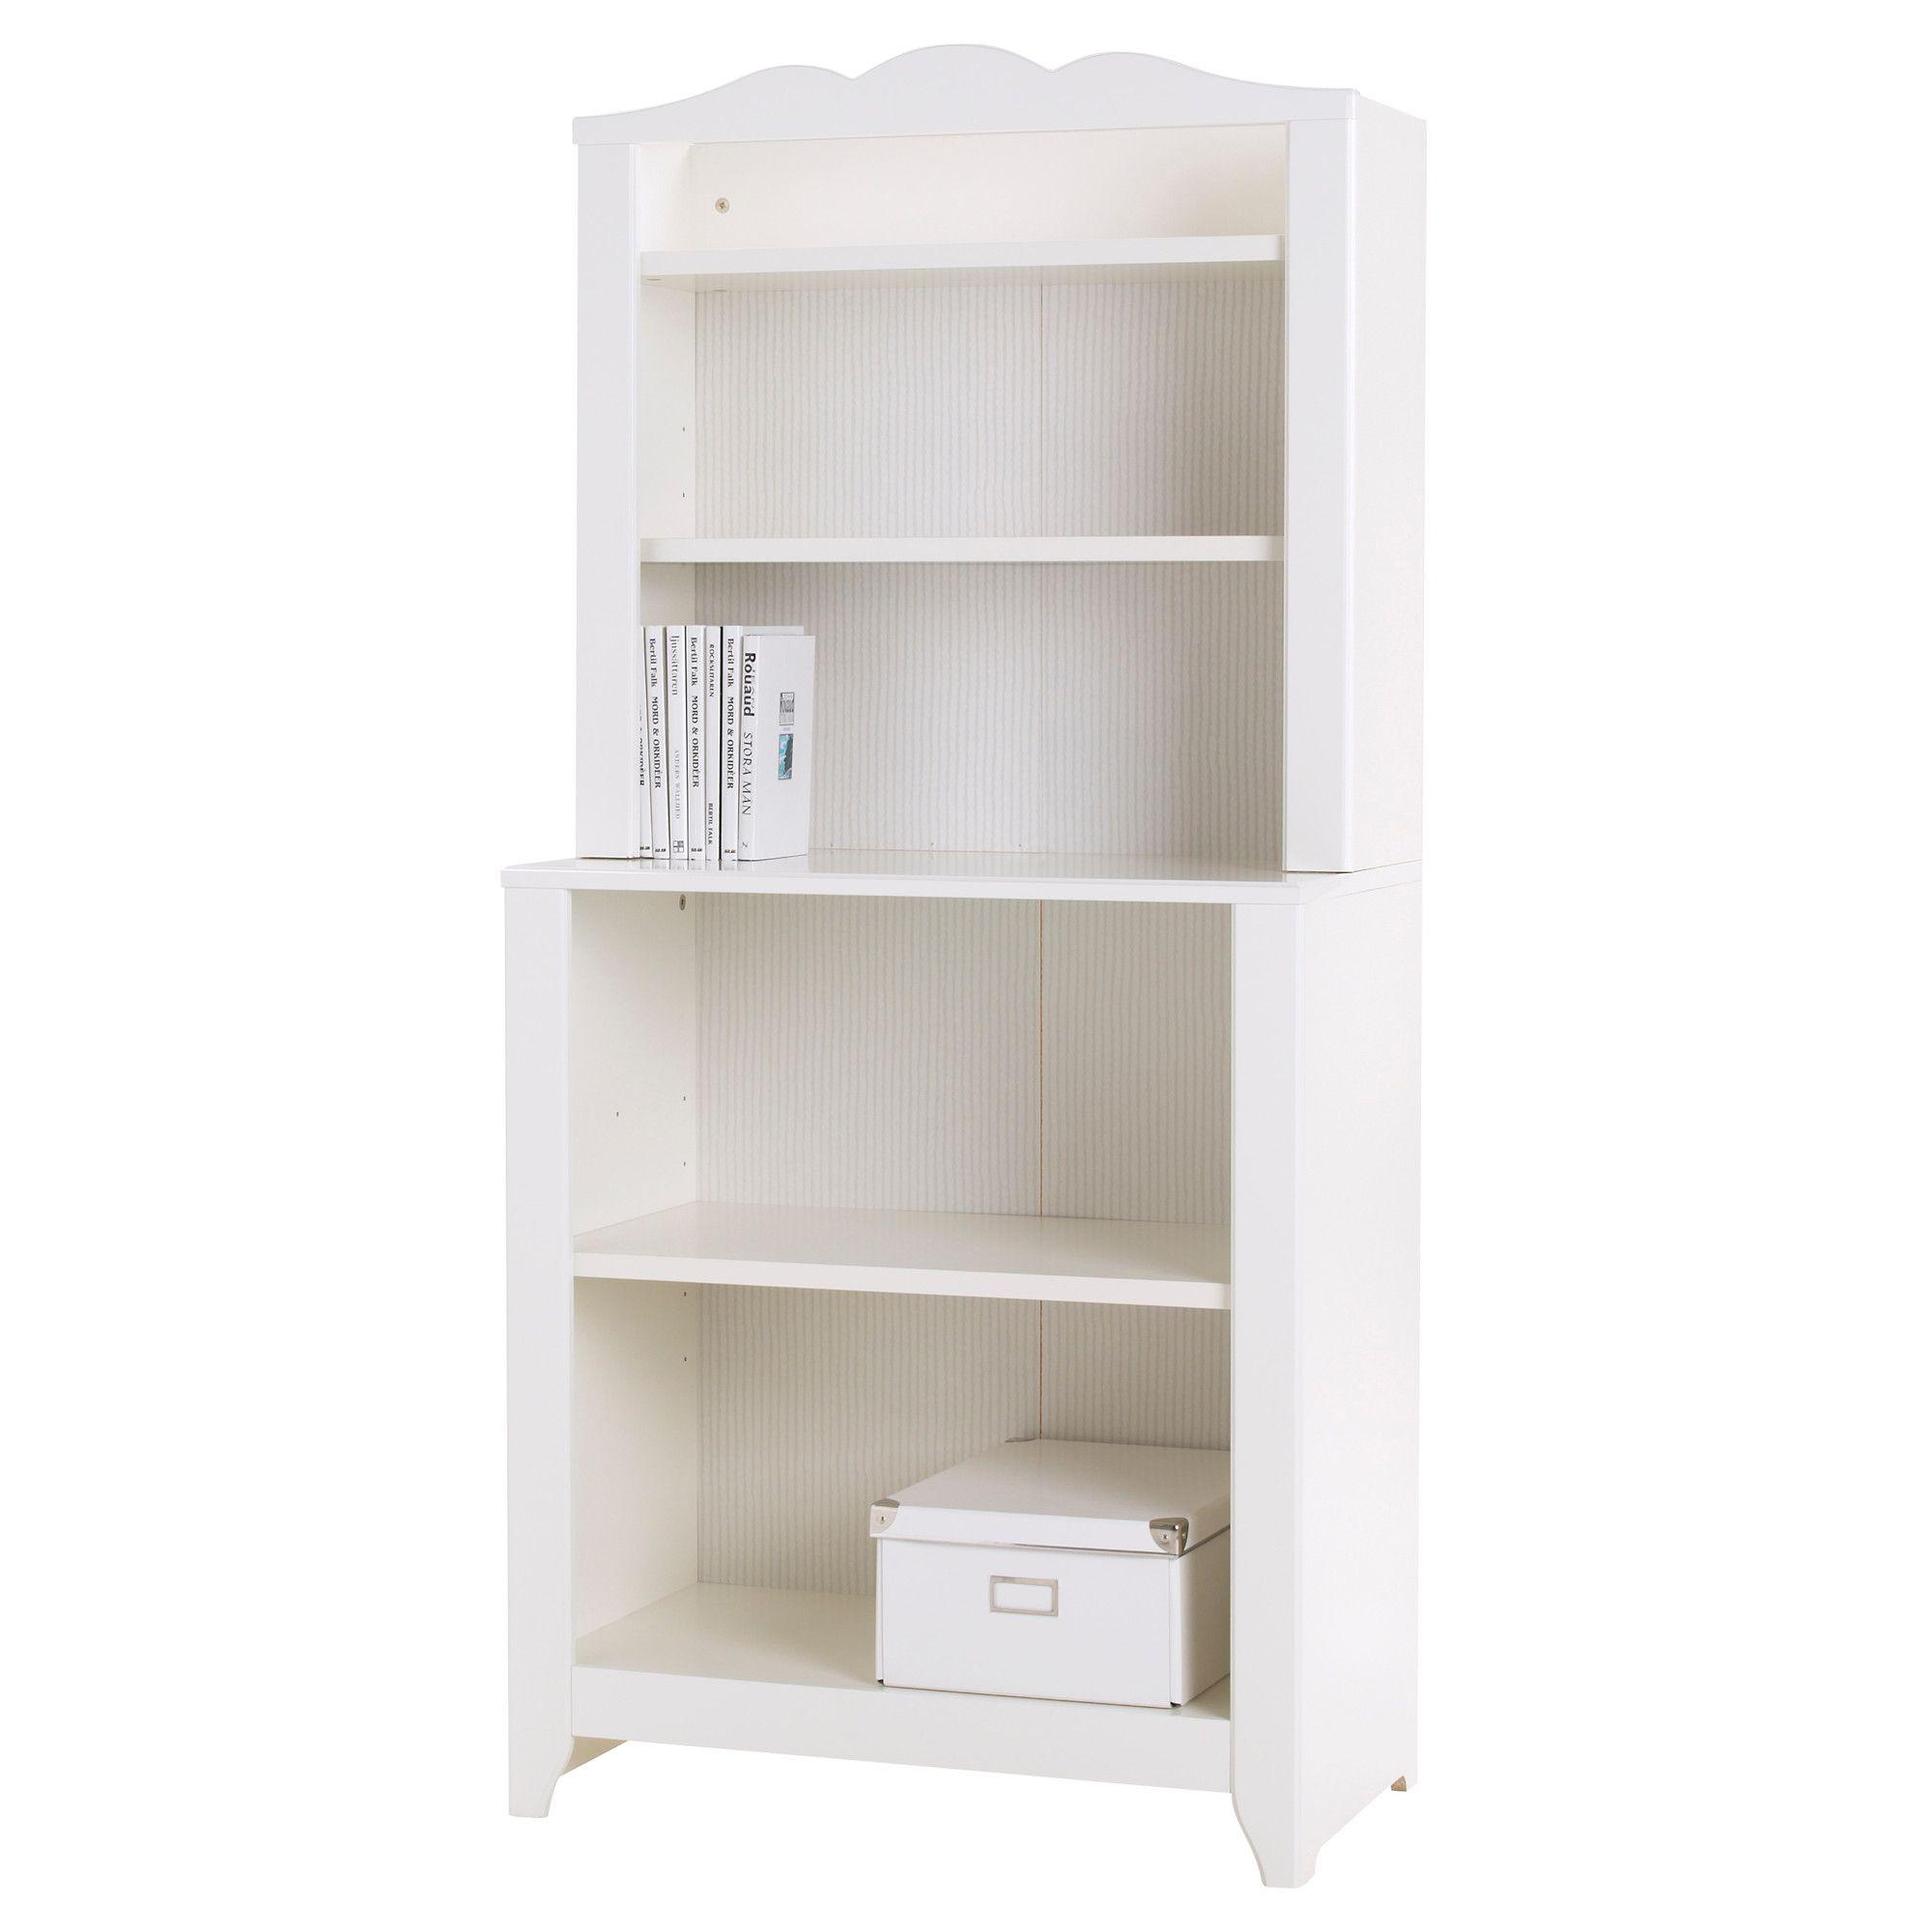 Us Furniture And Home Furnishings Ikea Hensvik